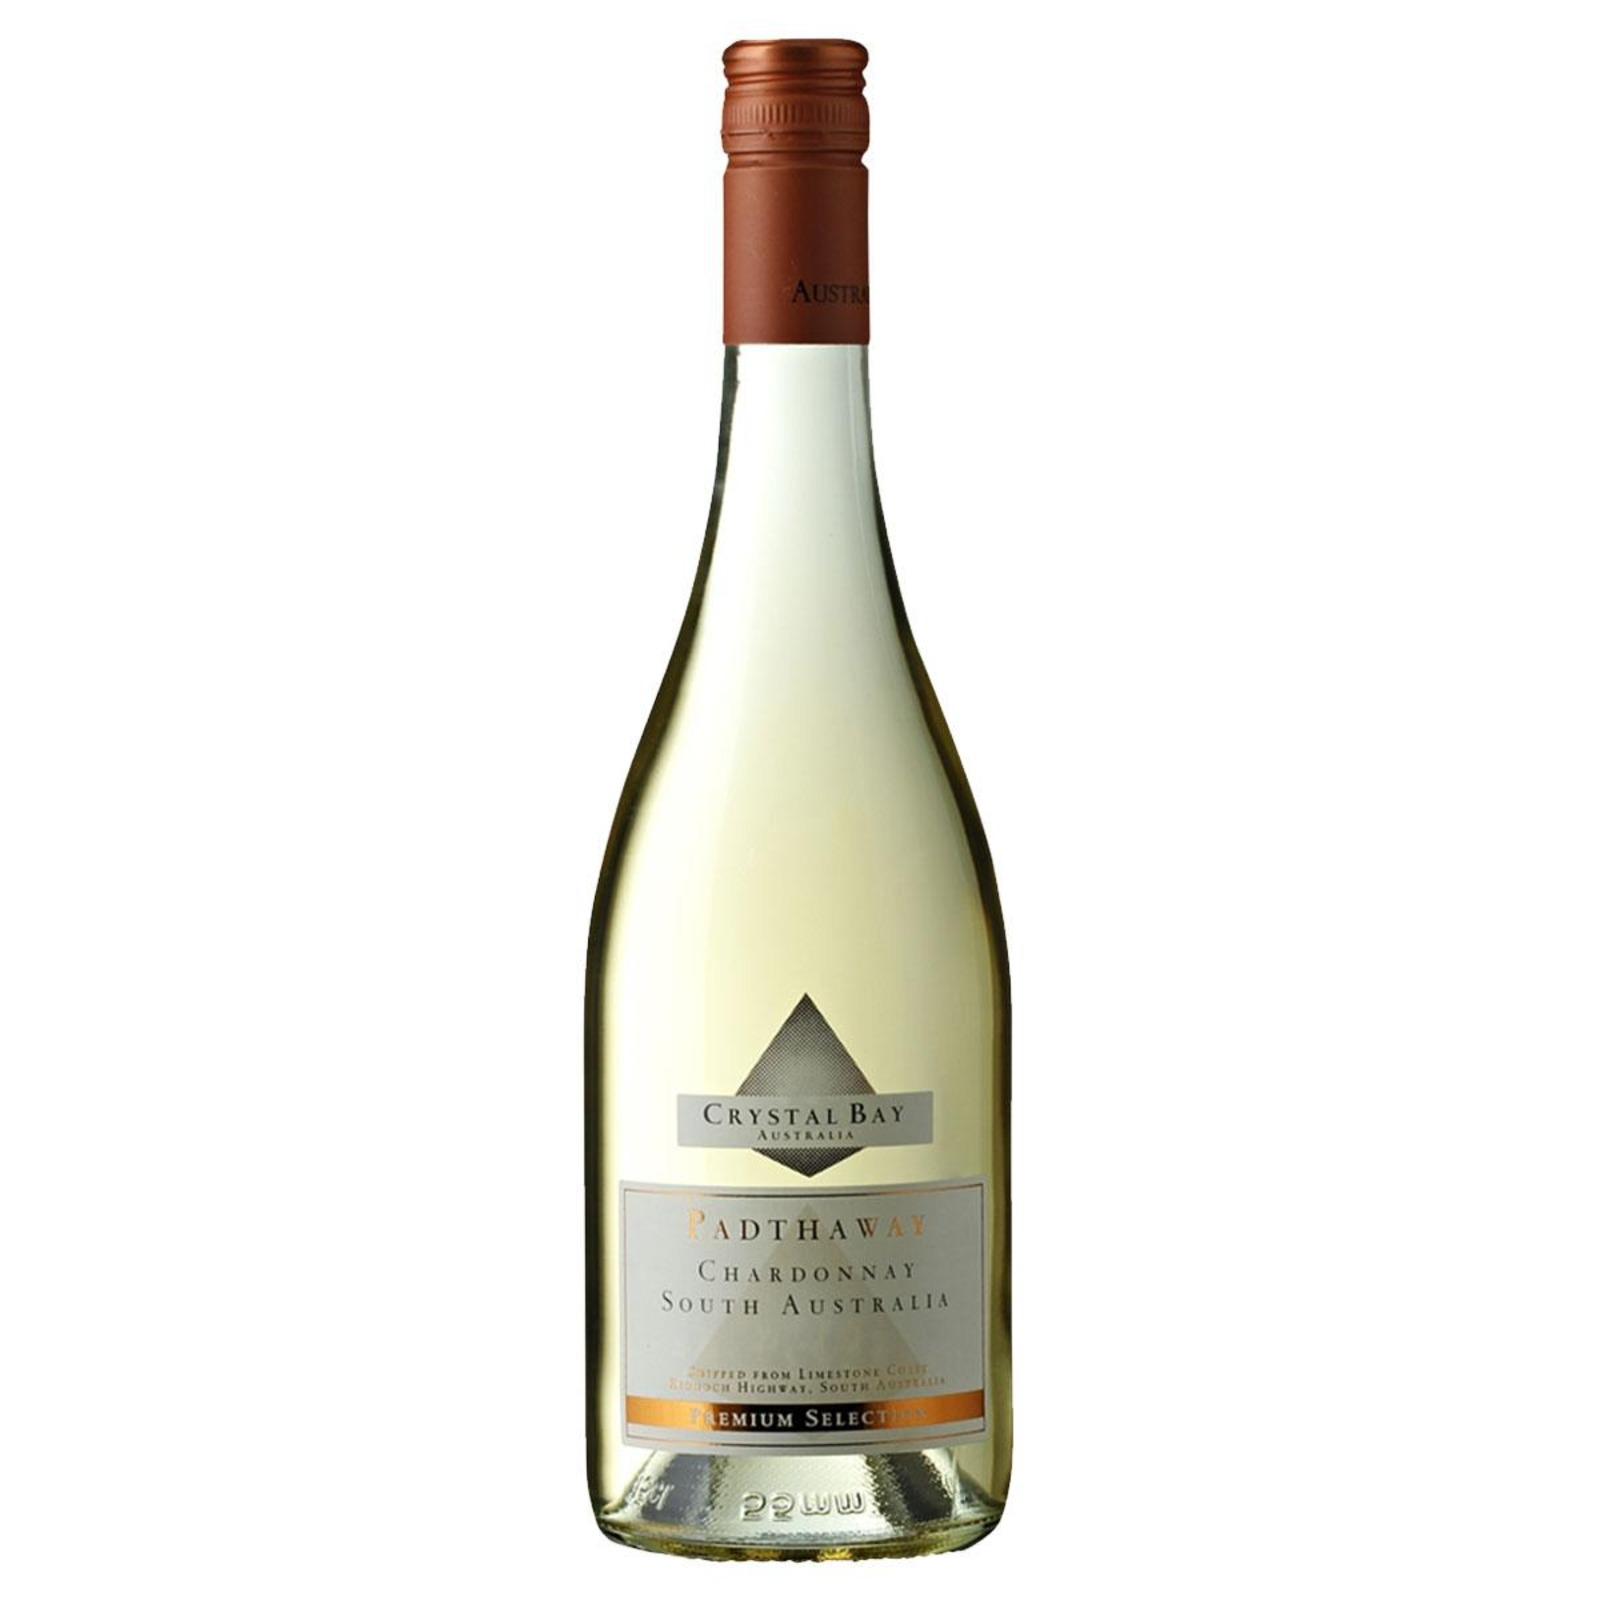 Crystal Bay Chardonnay Padthaway - White Wine